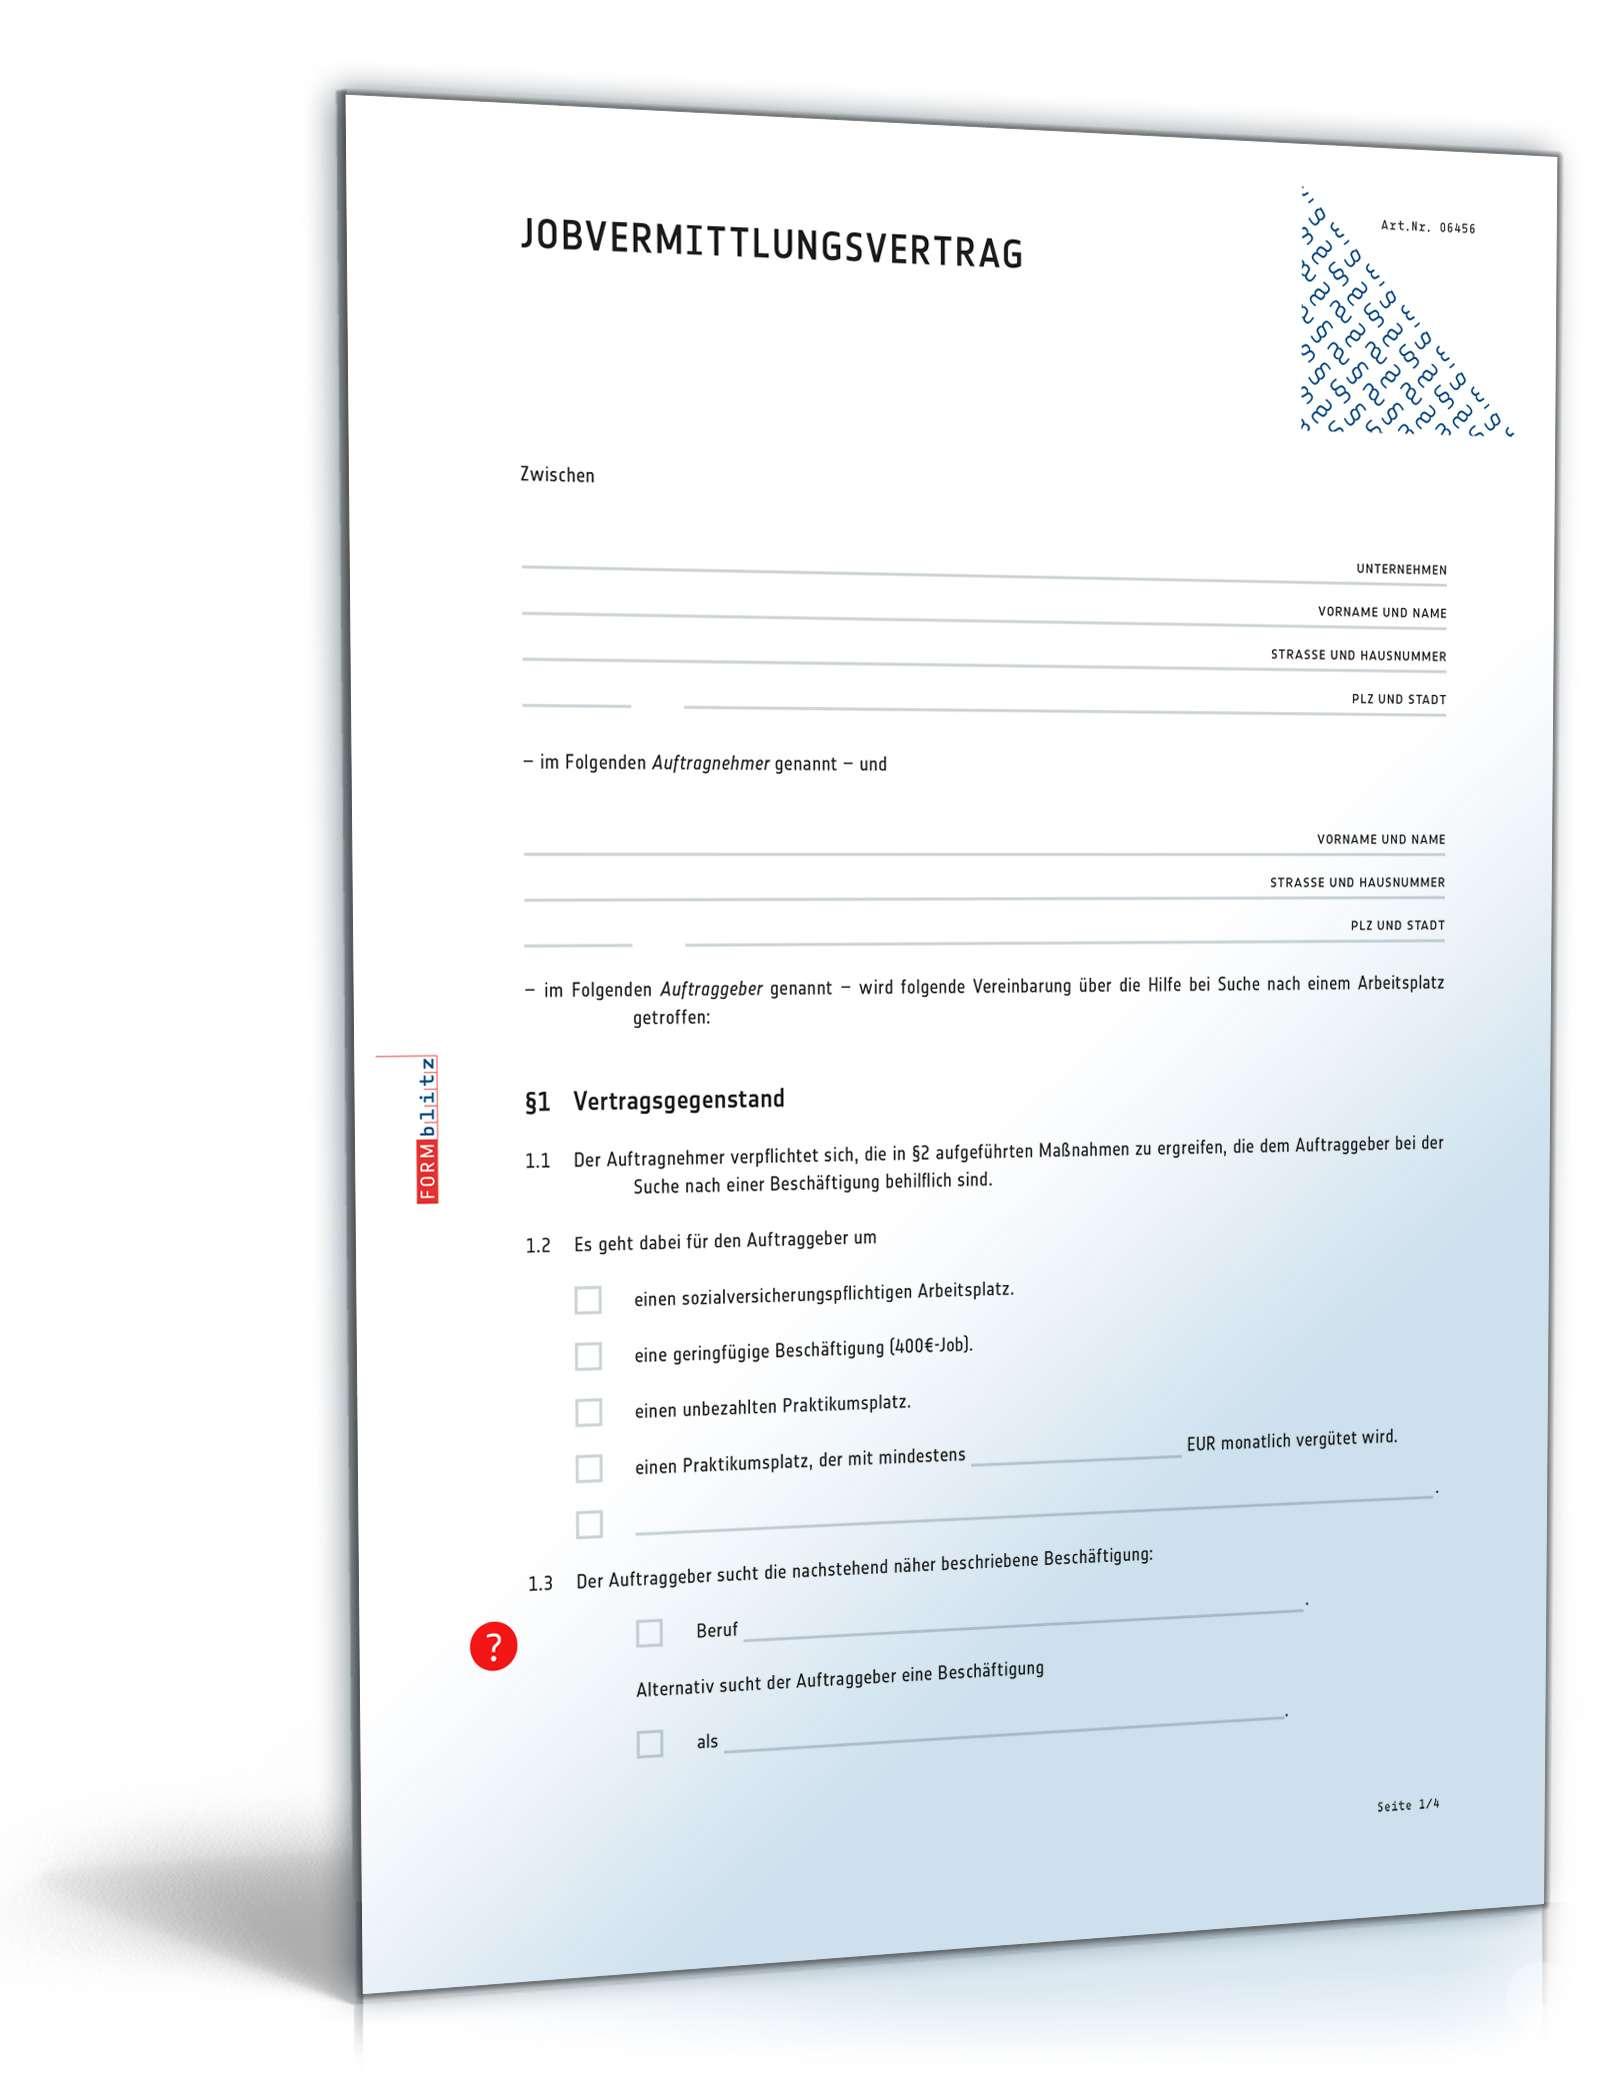 Vertrag Jobvermittlung Rechtssicheres Muster Zum Download